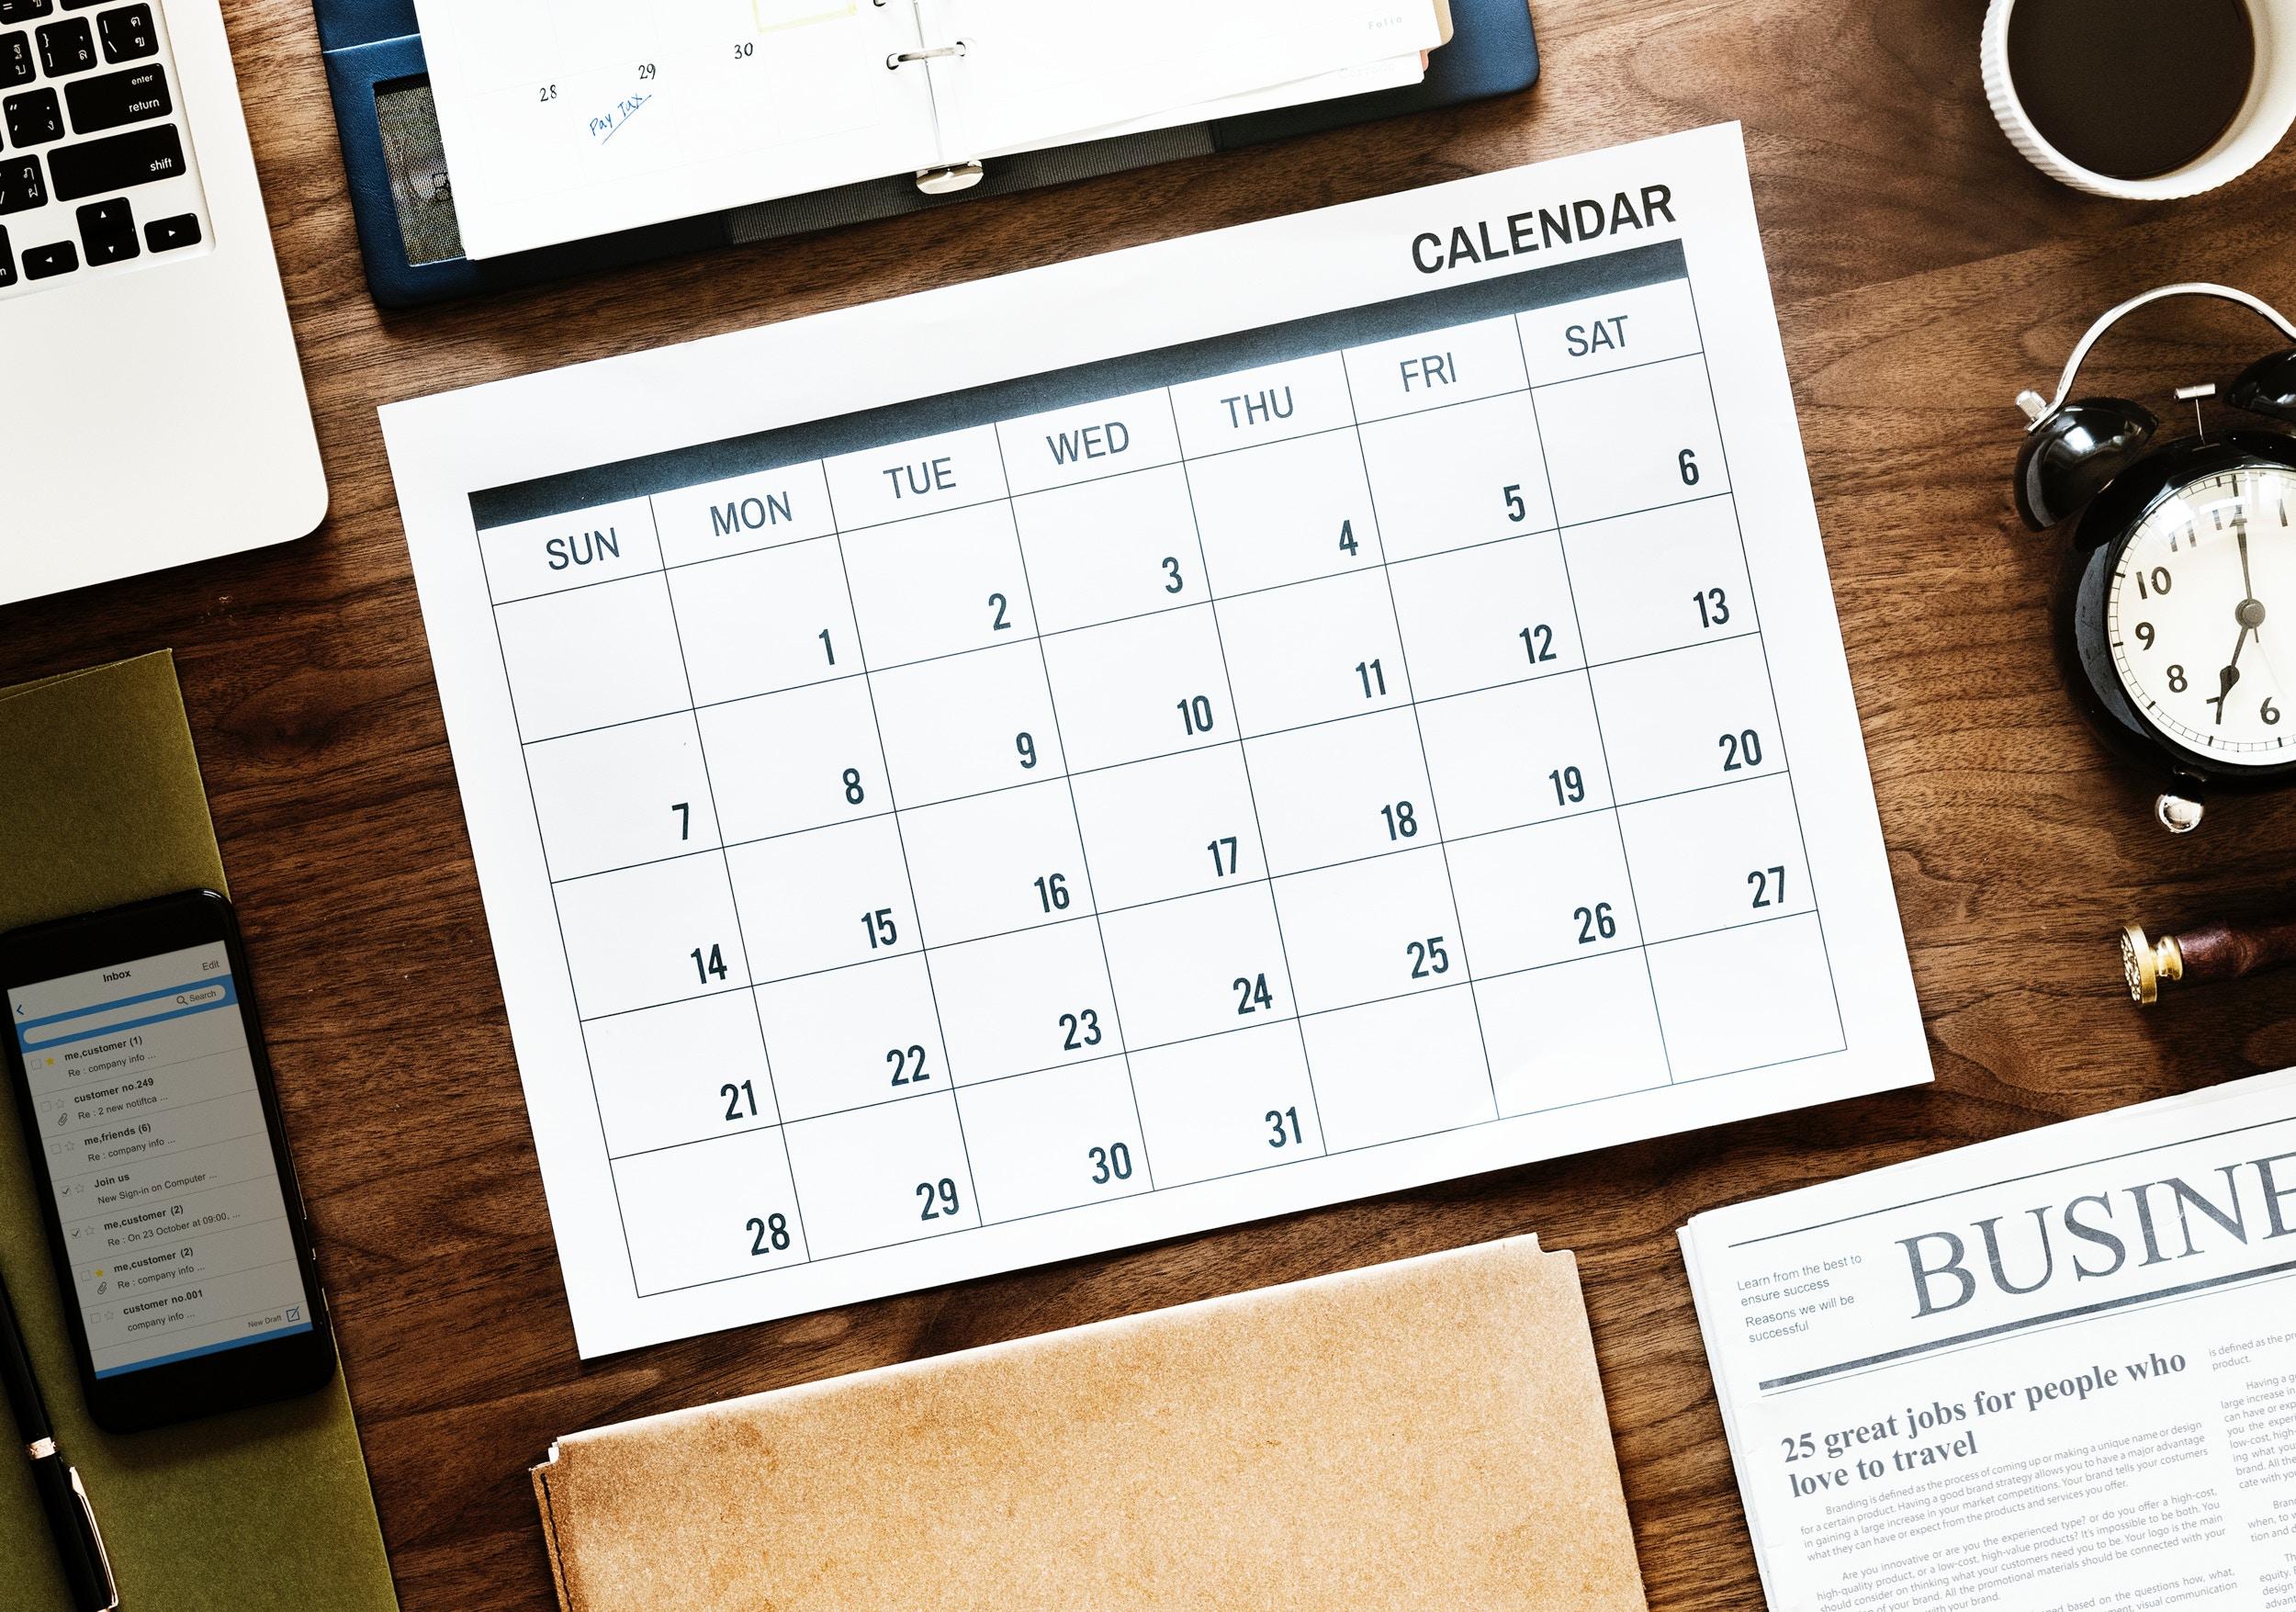 lsat study schedule